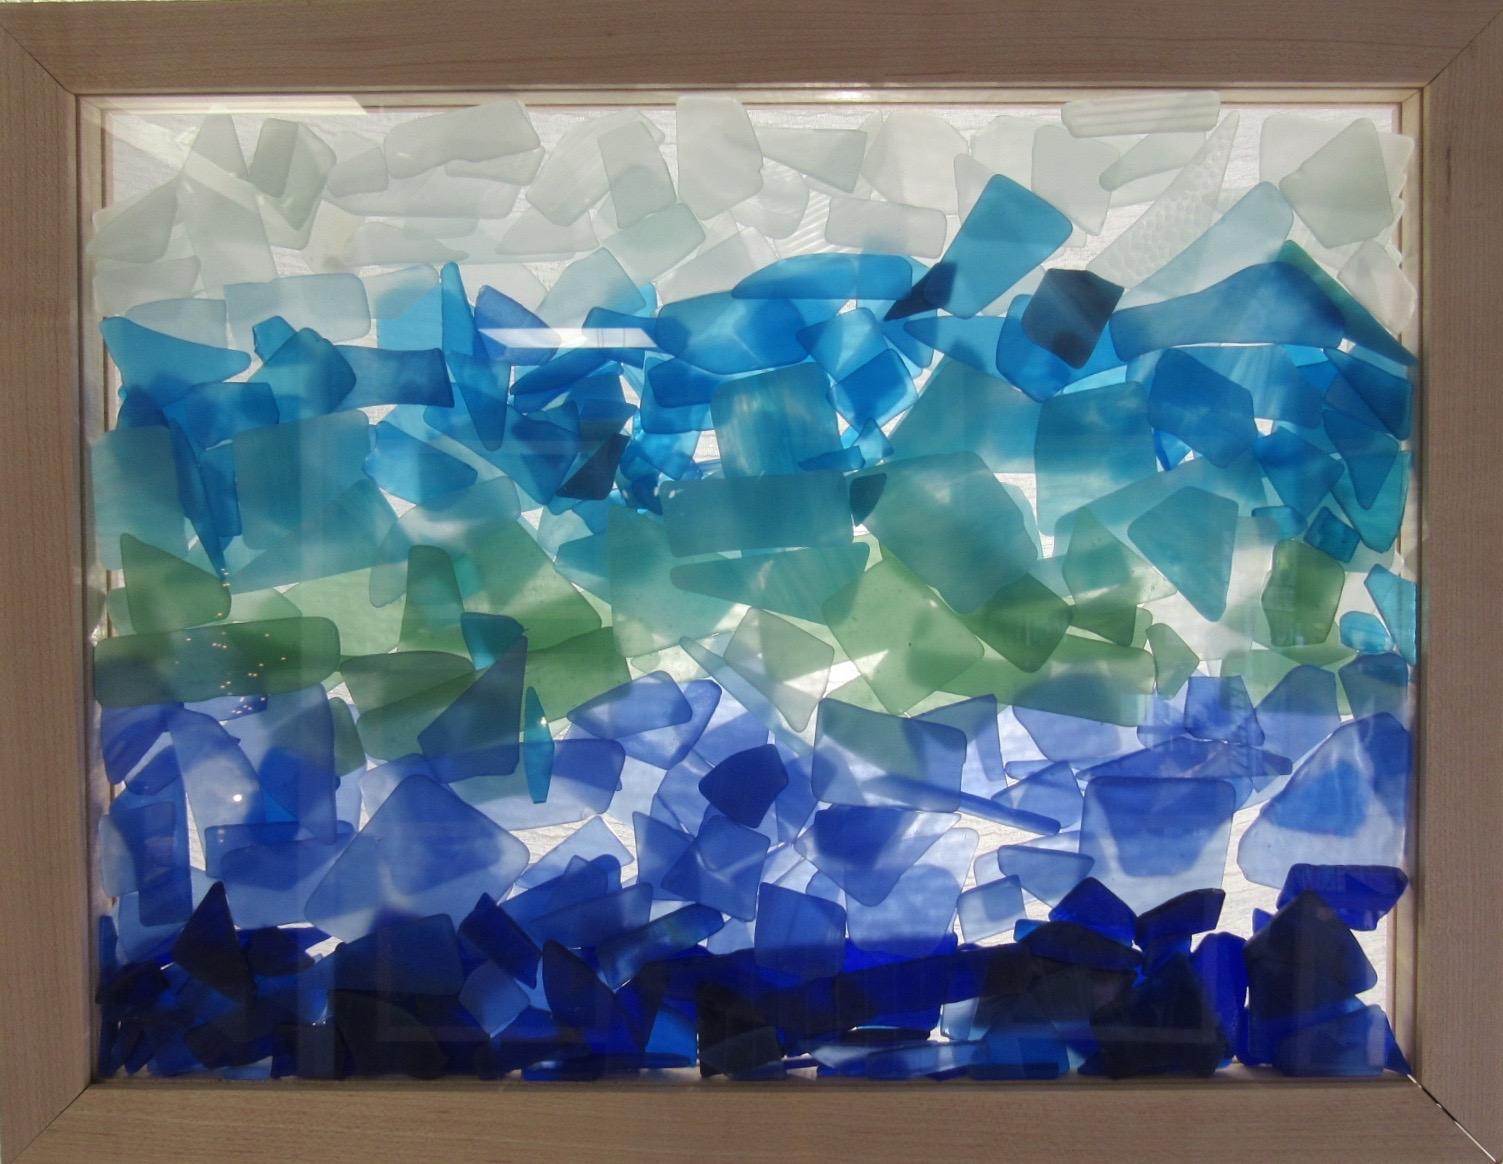 Sea Glass Inspired Seascape.Tumbled.Blue Ocean Depths.zoom 1.jpg